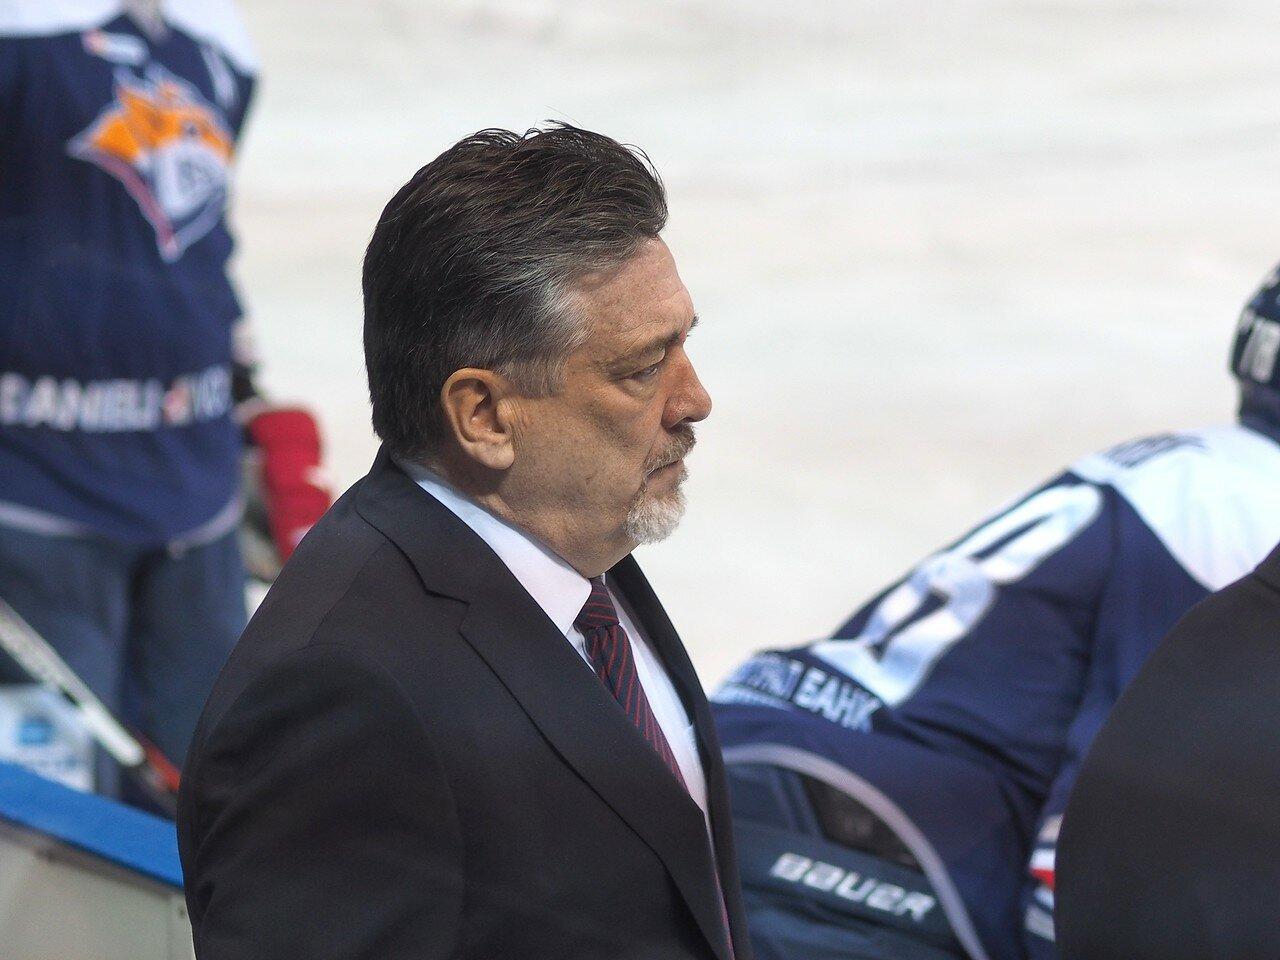 21Плей-офф 2016 Восток Финал Металлург - Салават Юлаев 23.03.2016